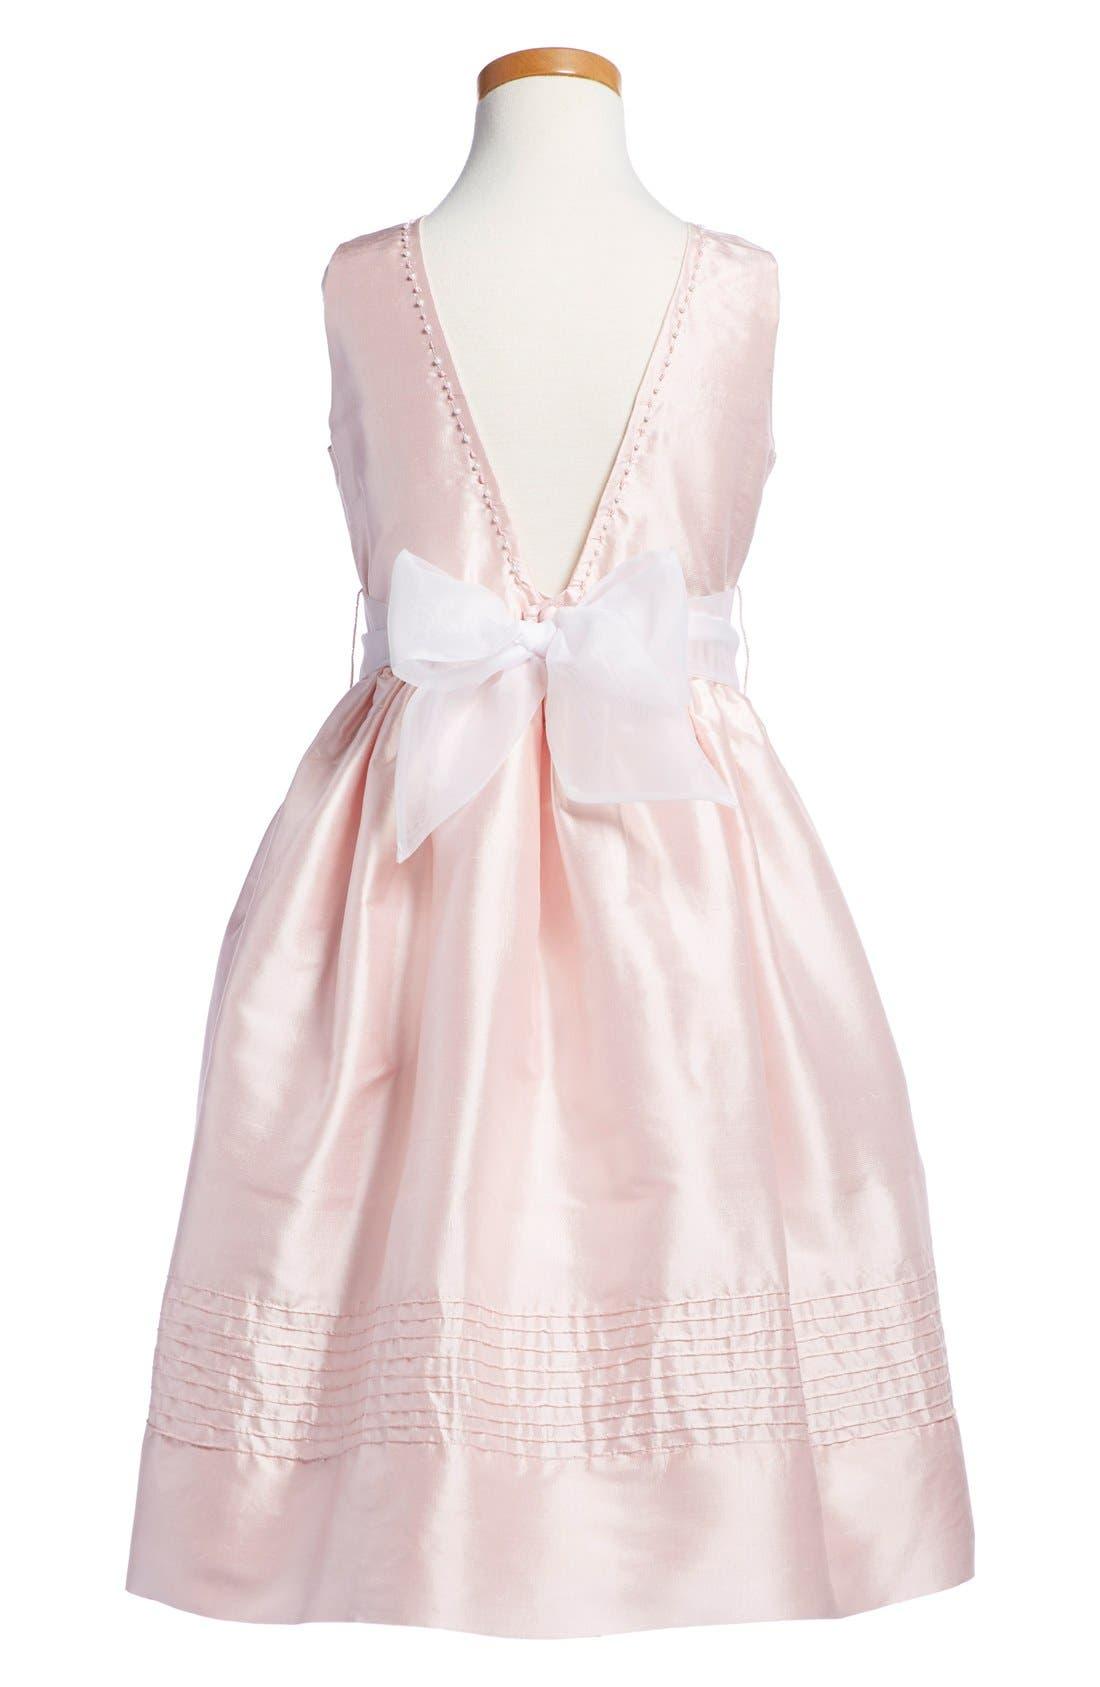 'Melody' Sleeveless Dress,                             Alternate thumbnail 2, color,                             689